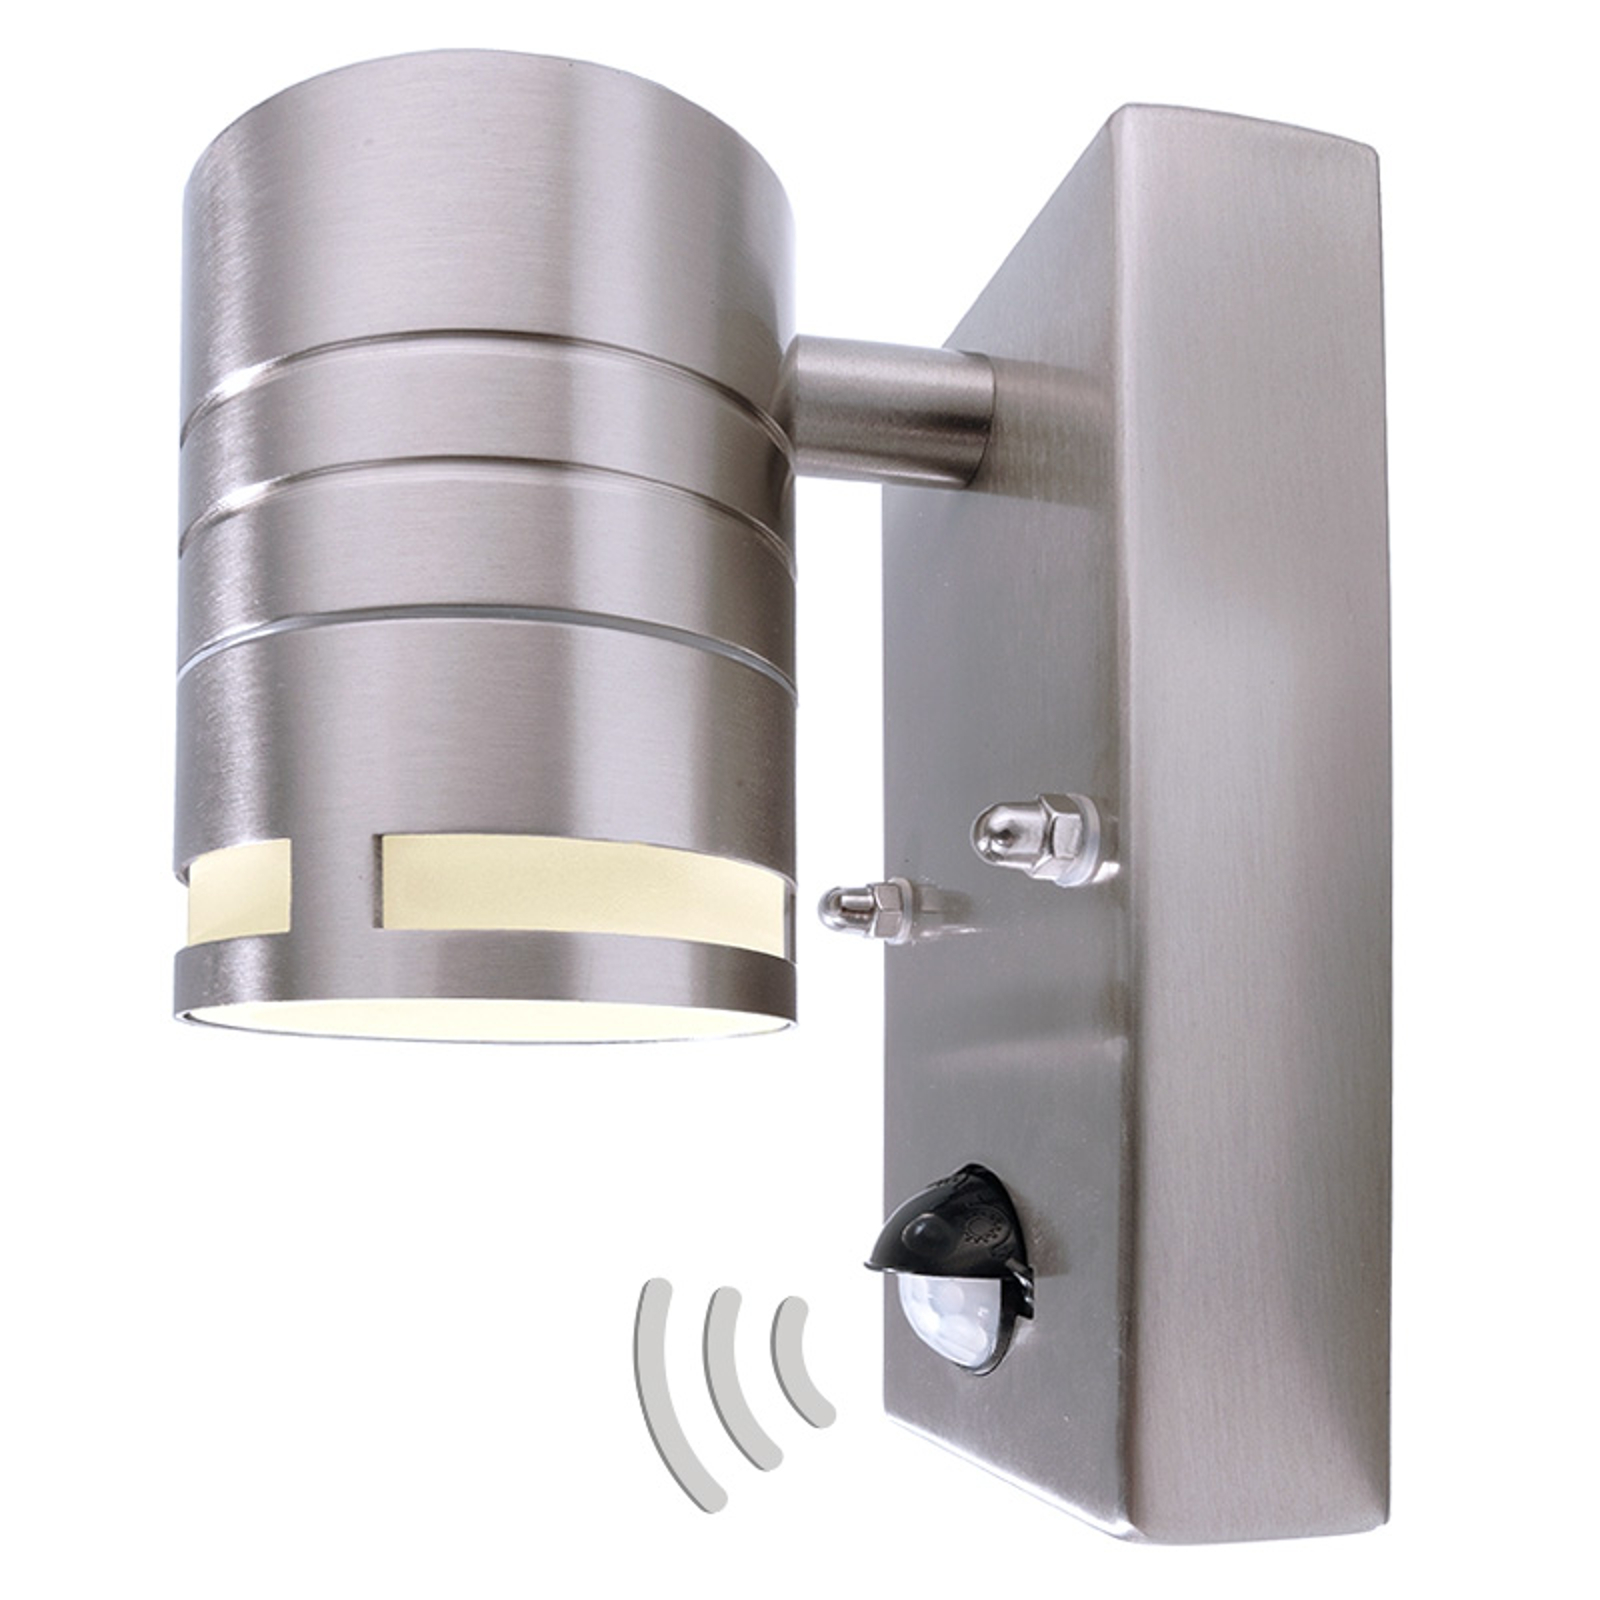 Piccola applique Zilly II con sensore movimento